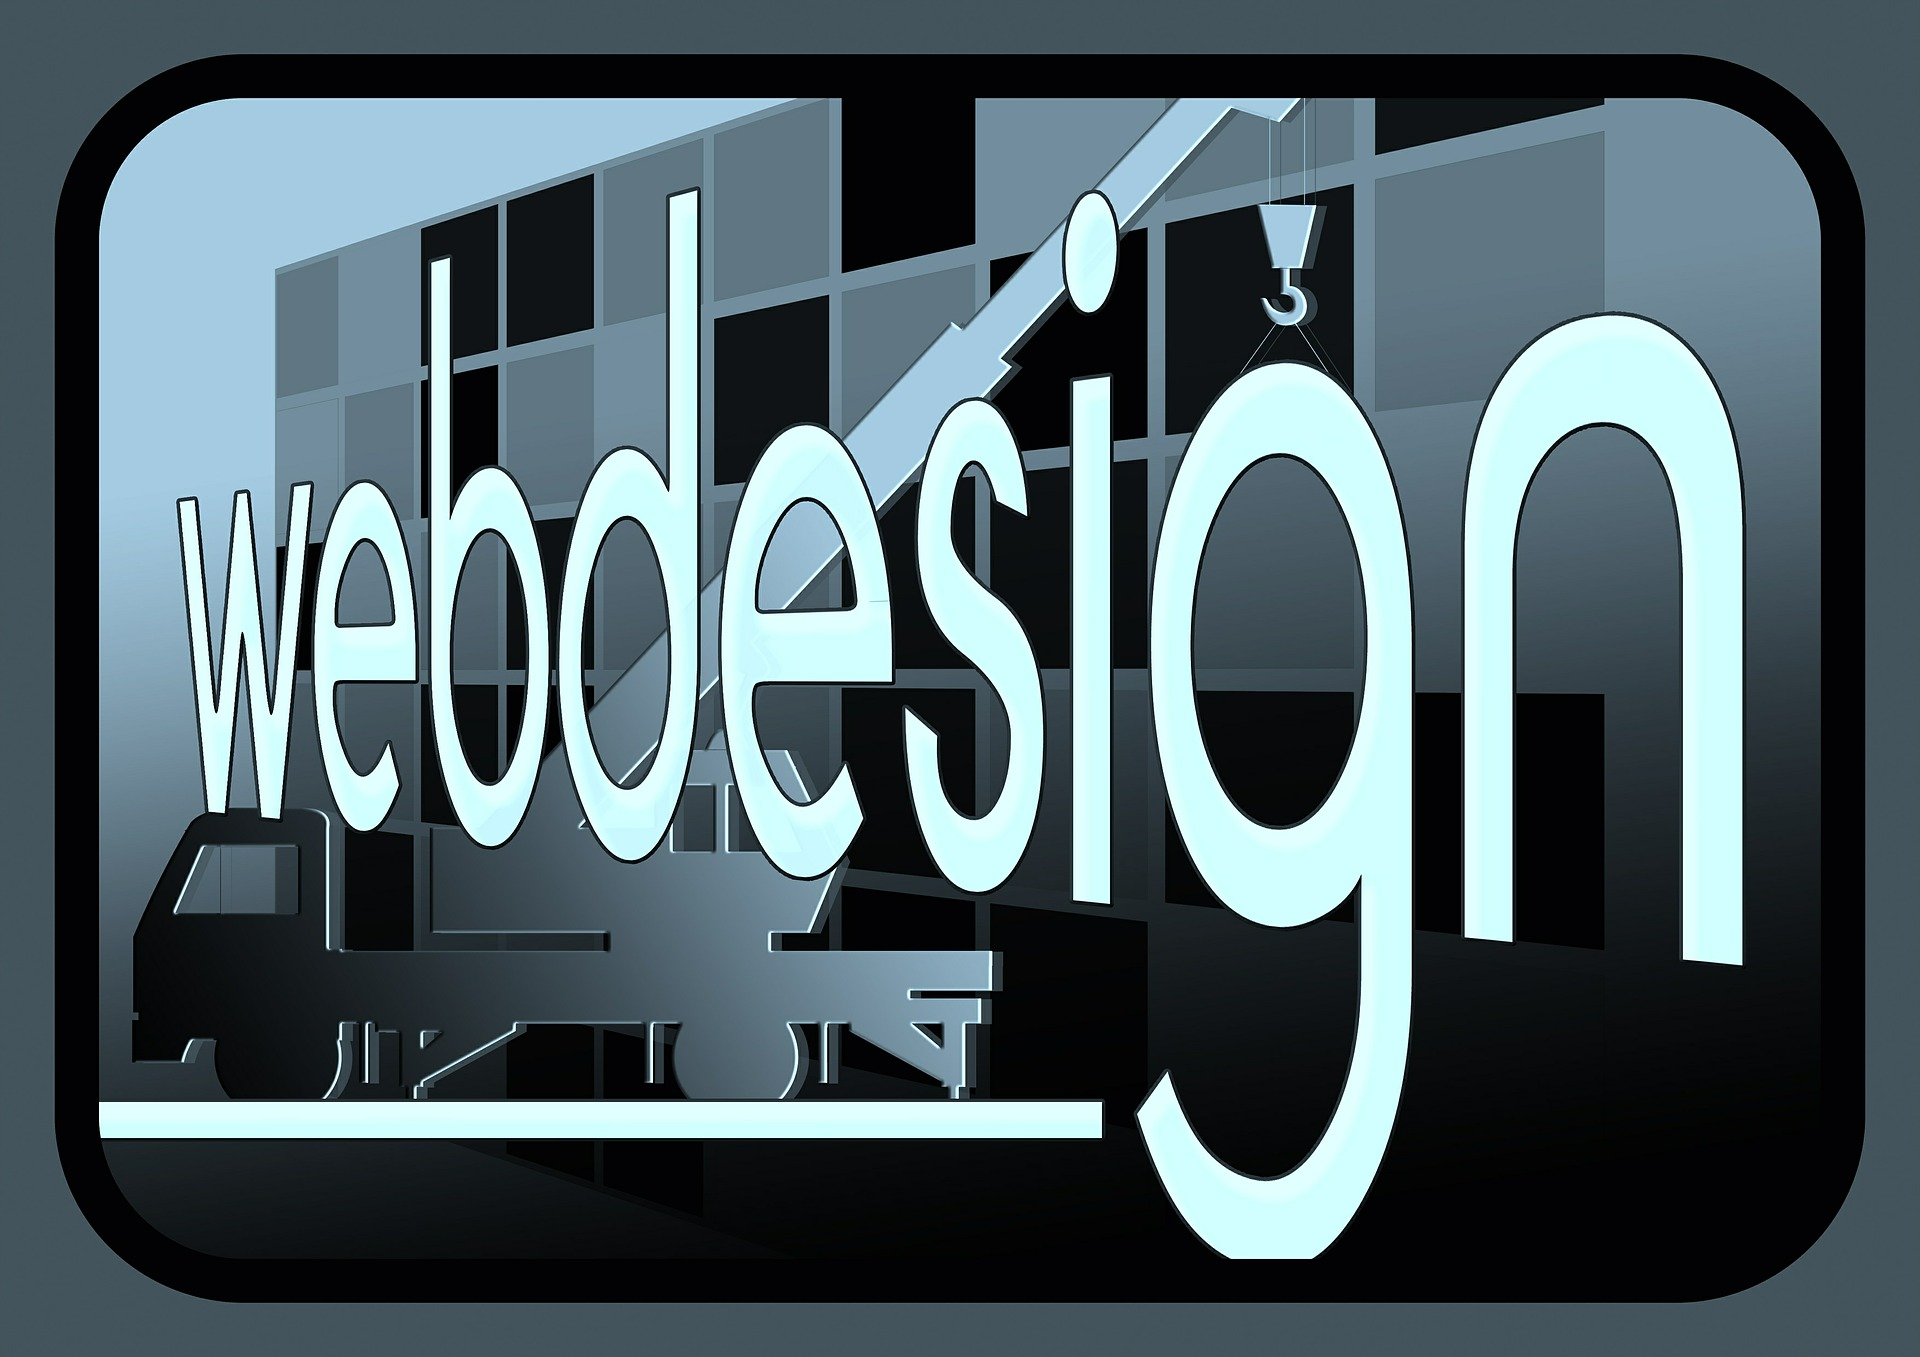 SST Website Design and Development